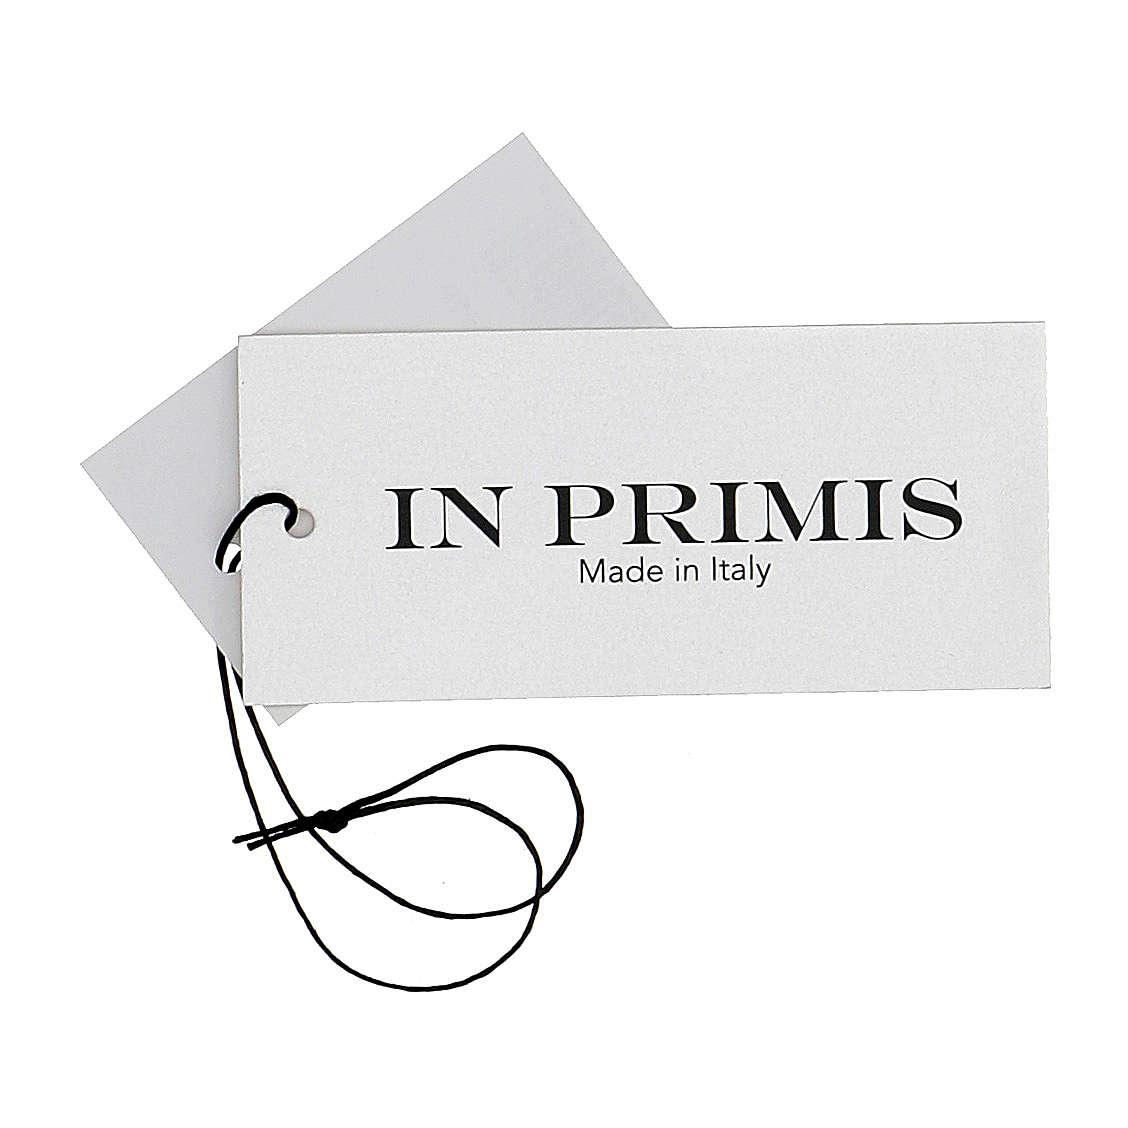 Giacca sacerdote blu tasche e bottoni 50% lana merino 50% acrilico In Primis 4